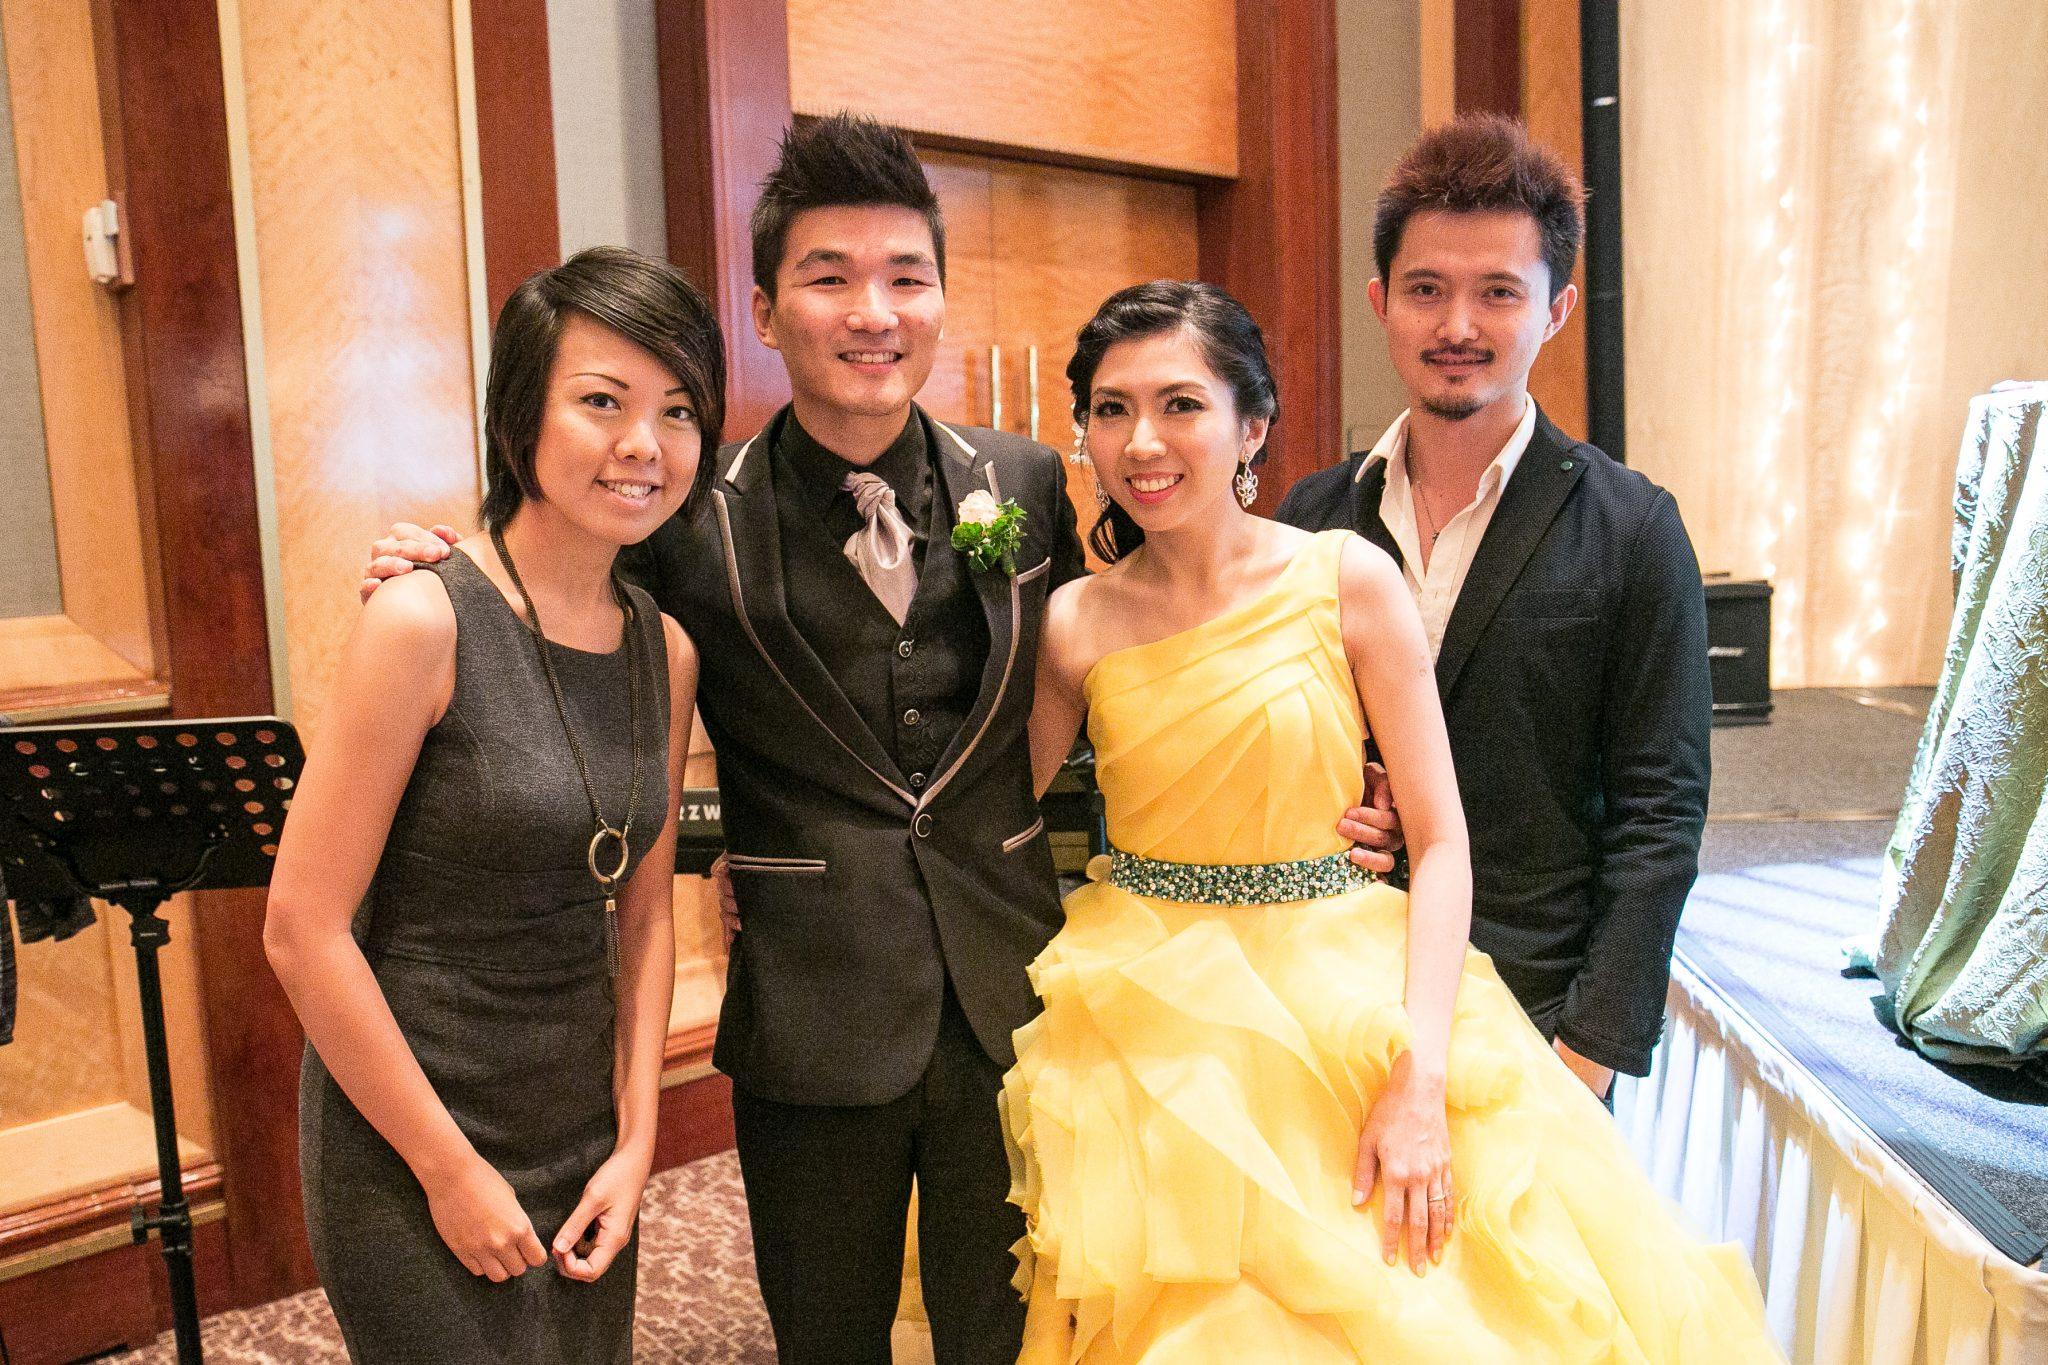 Song Hua & Hui Min's Wedding, Sheration Hotel - Redkite